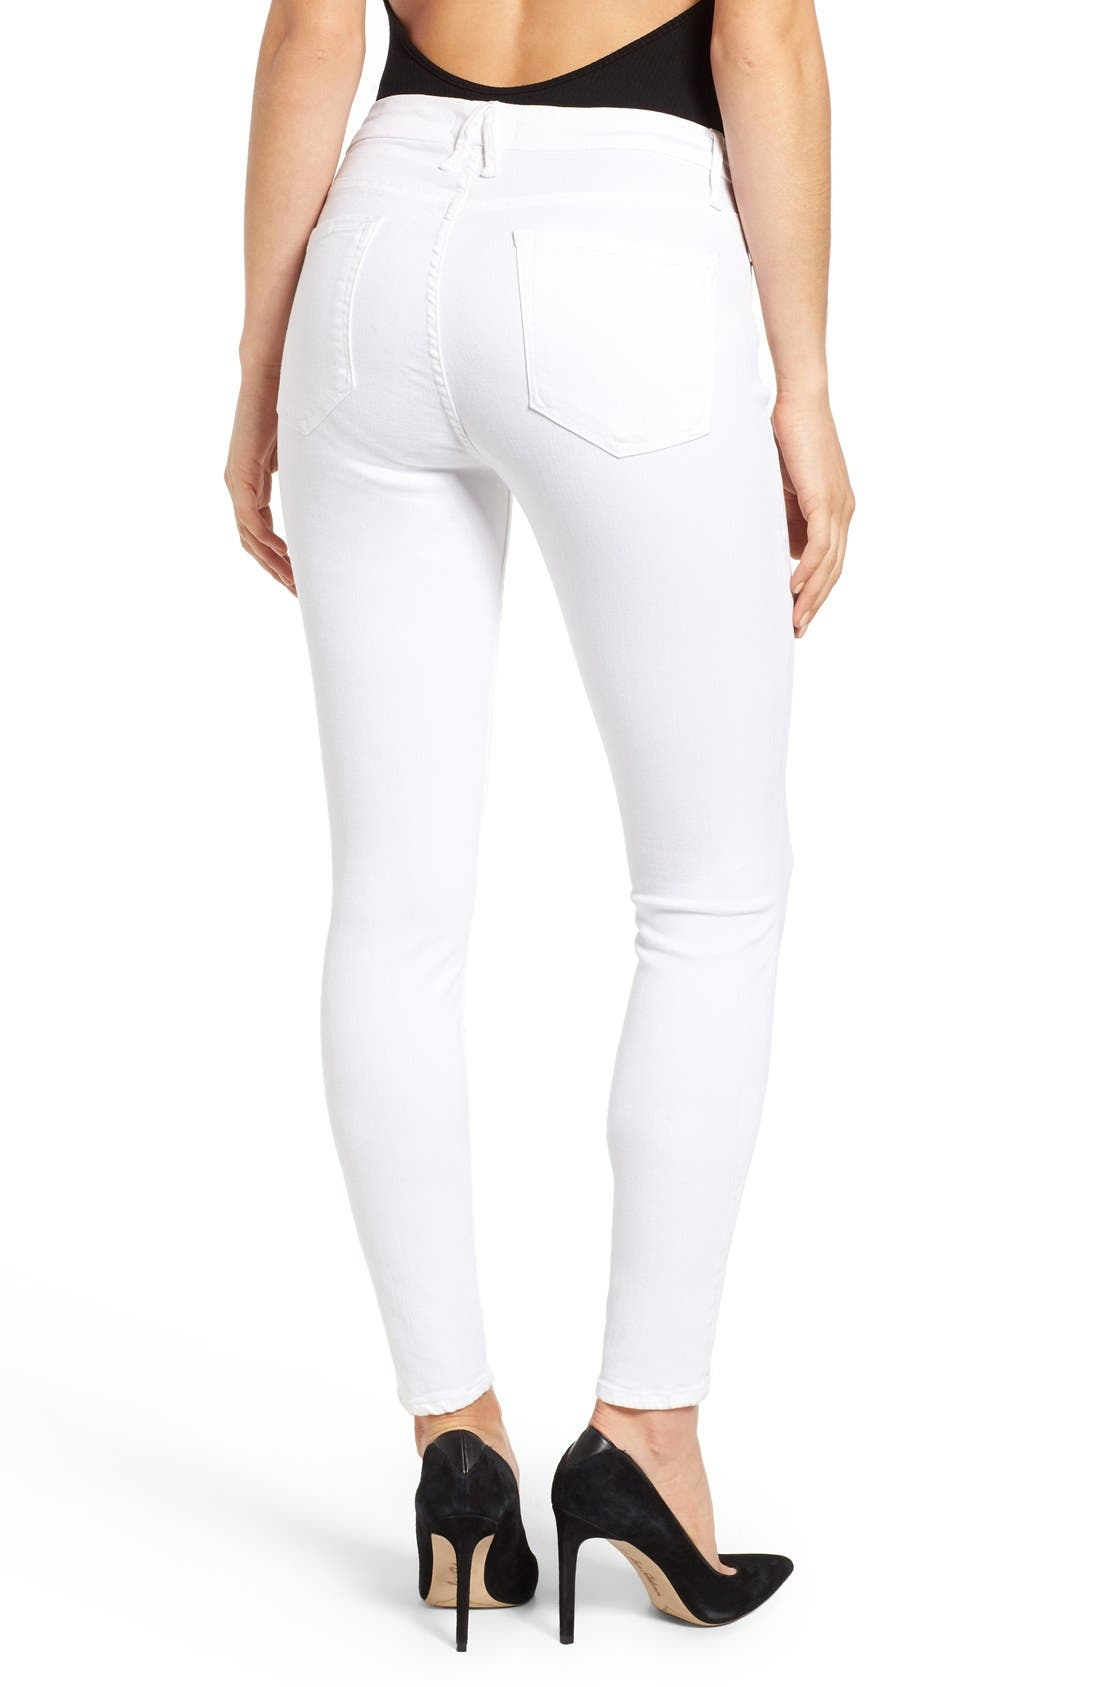 Alternate Image 2  - Good American Good Legs High Rise Skinny Jeans (White 001) (Extended Sizes)